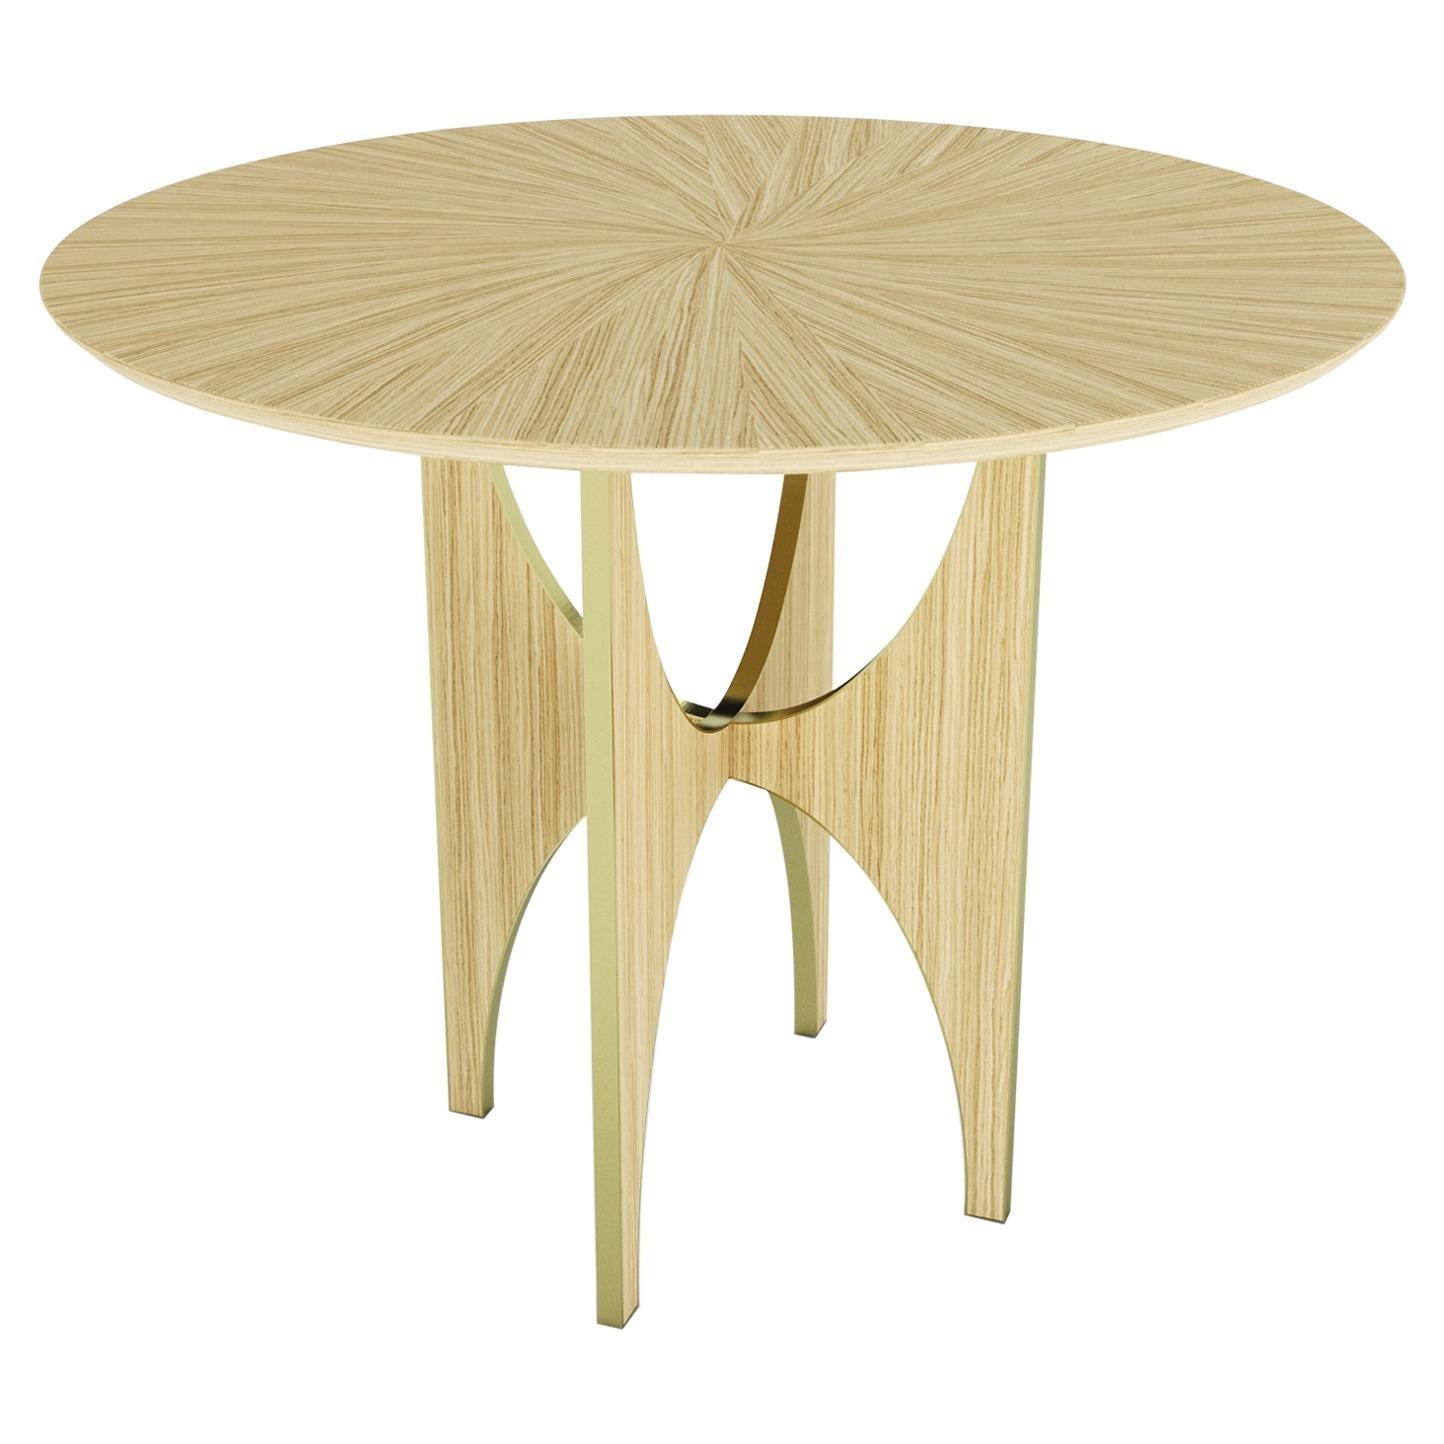 Geometric Round Side Table White Oak Wood Brass Metal Stainless Steel